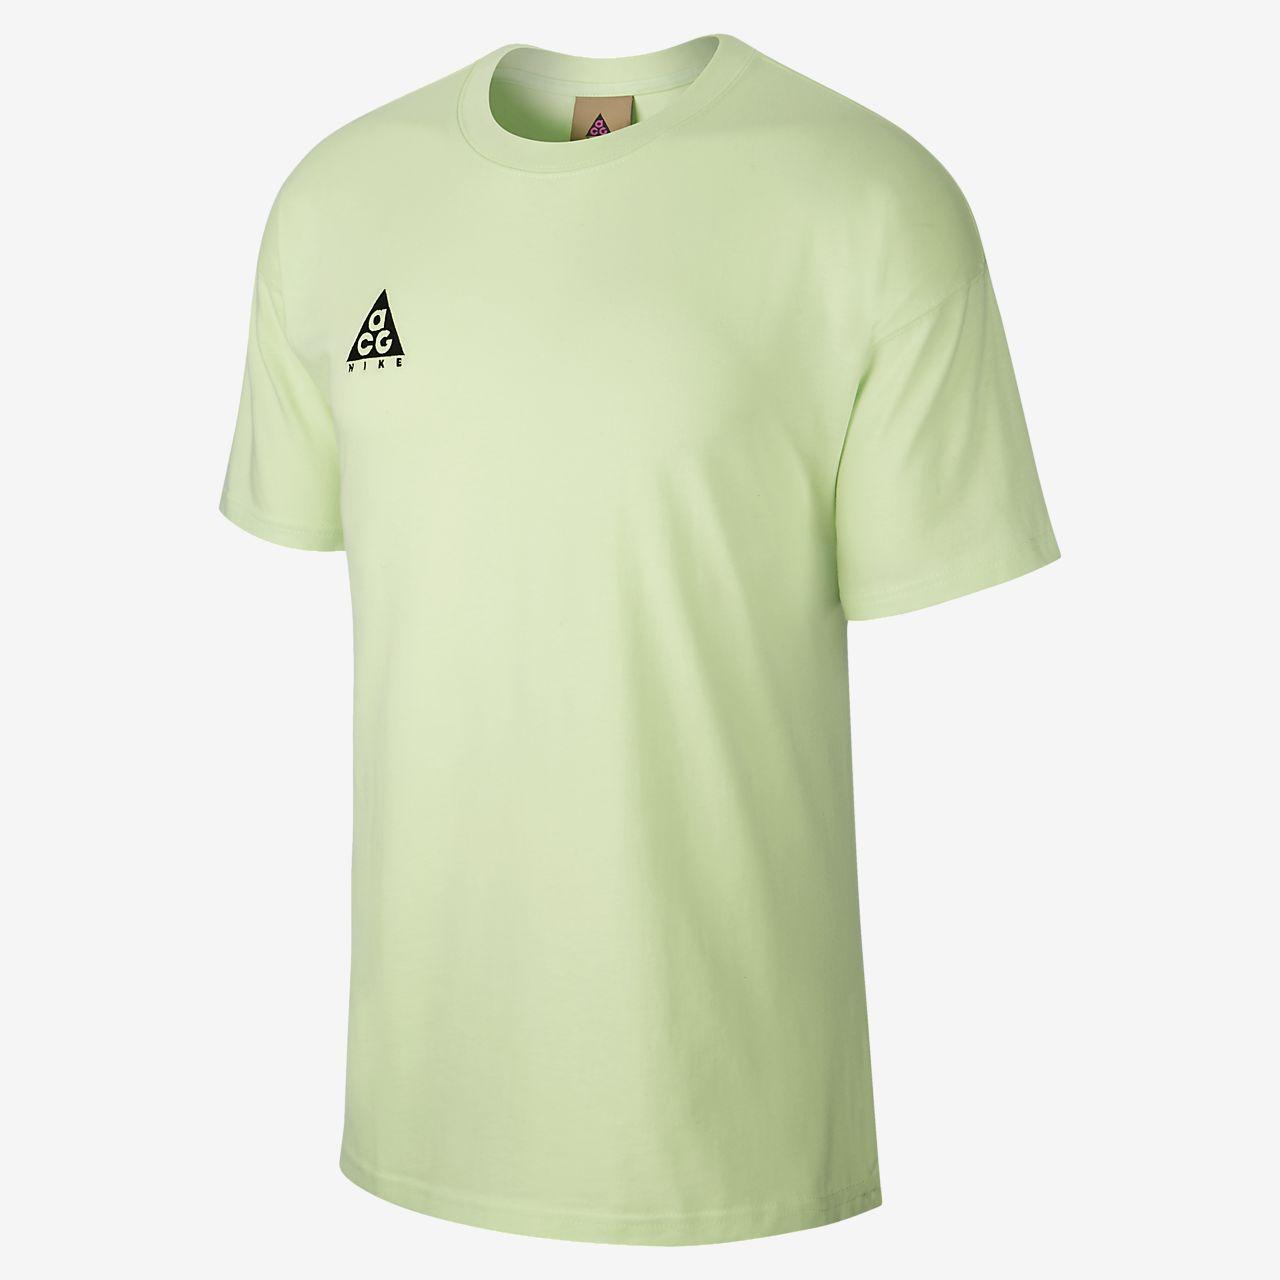 0d76396acf90c7 Nike ACG Logo T-Shirt. Nike.com PT